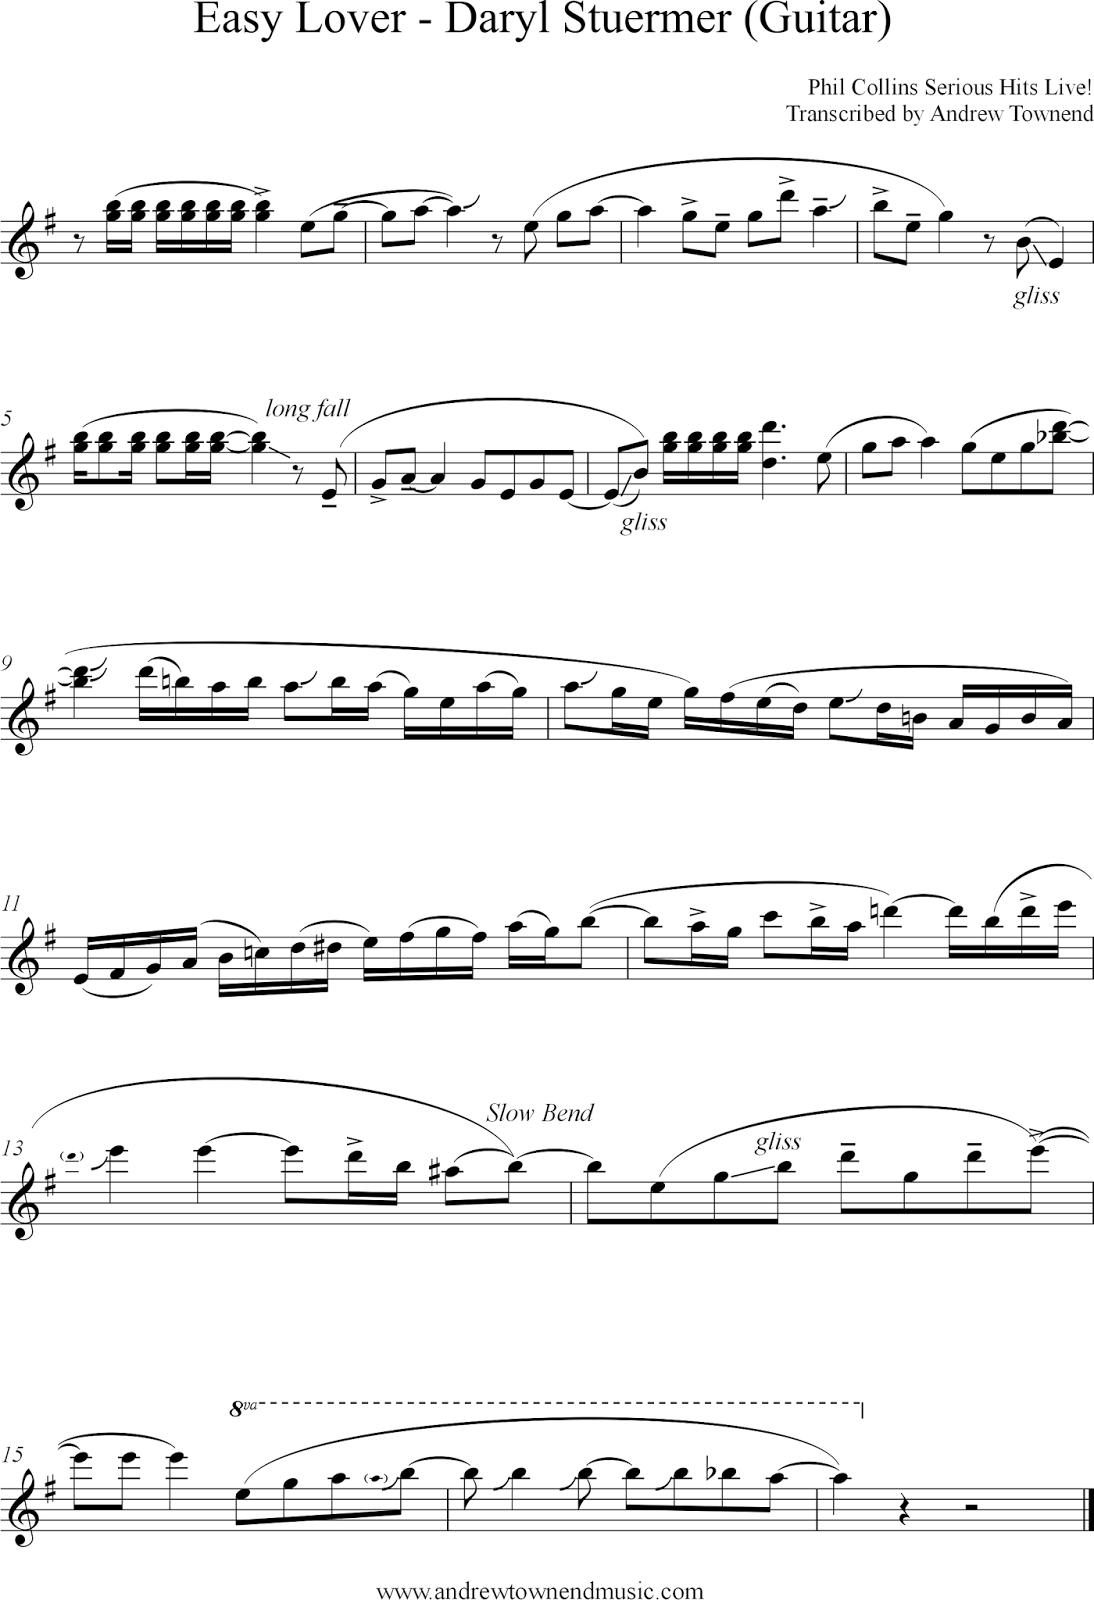 Guitar Transcription - Easy Lover